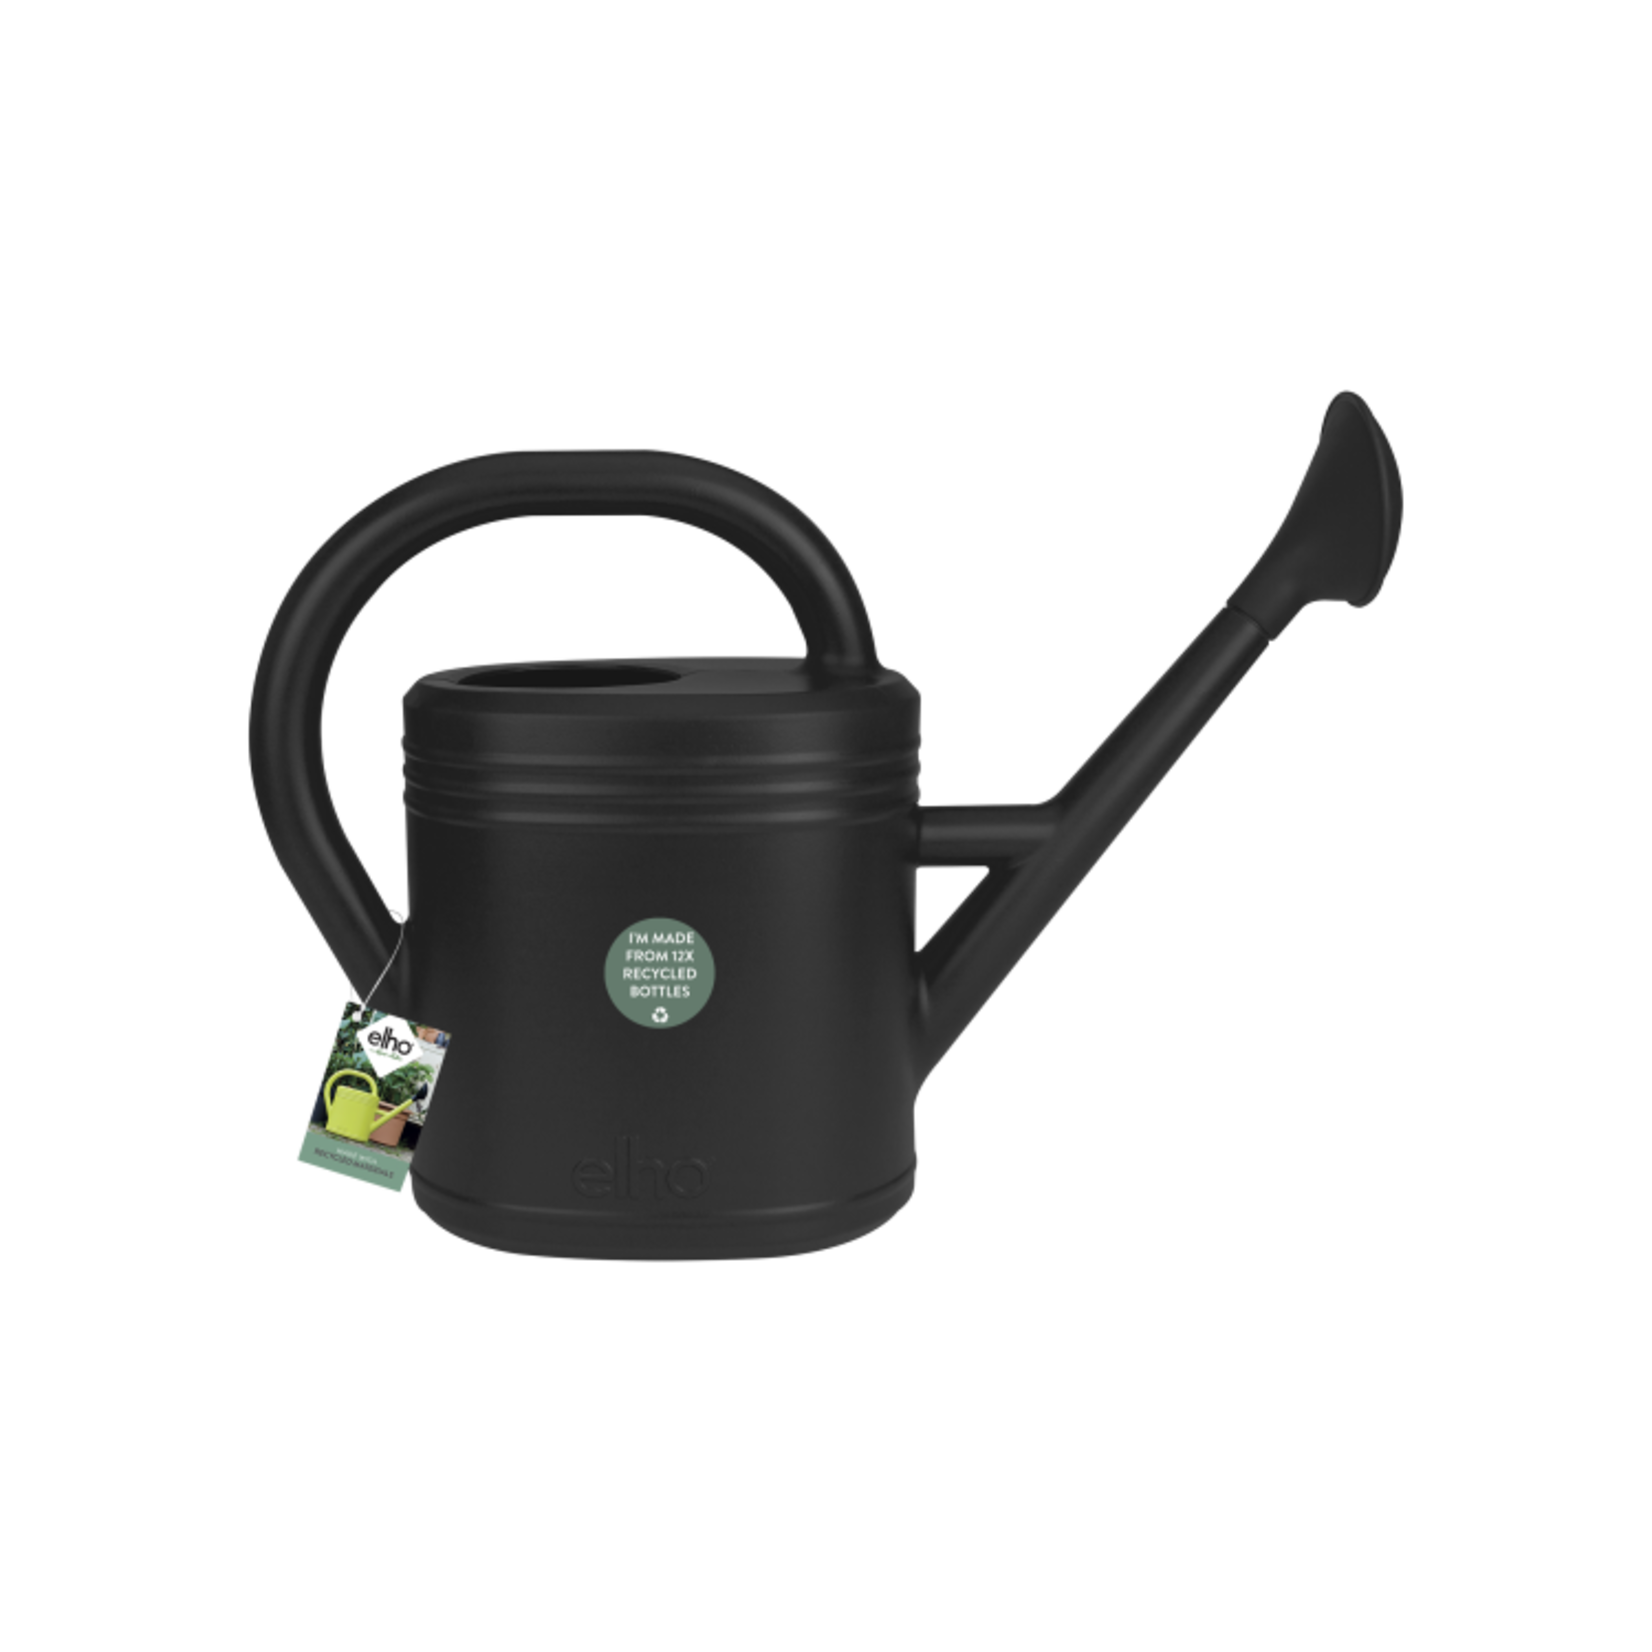 Elho Elho Green Basics Watering Can 10L Living Black